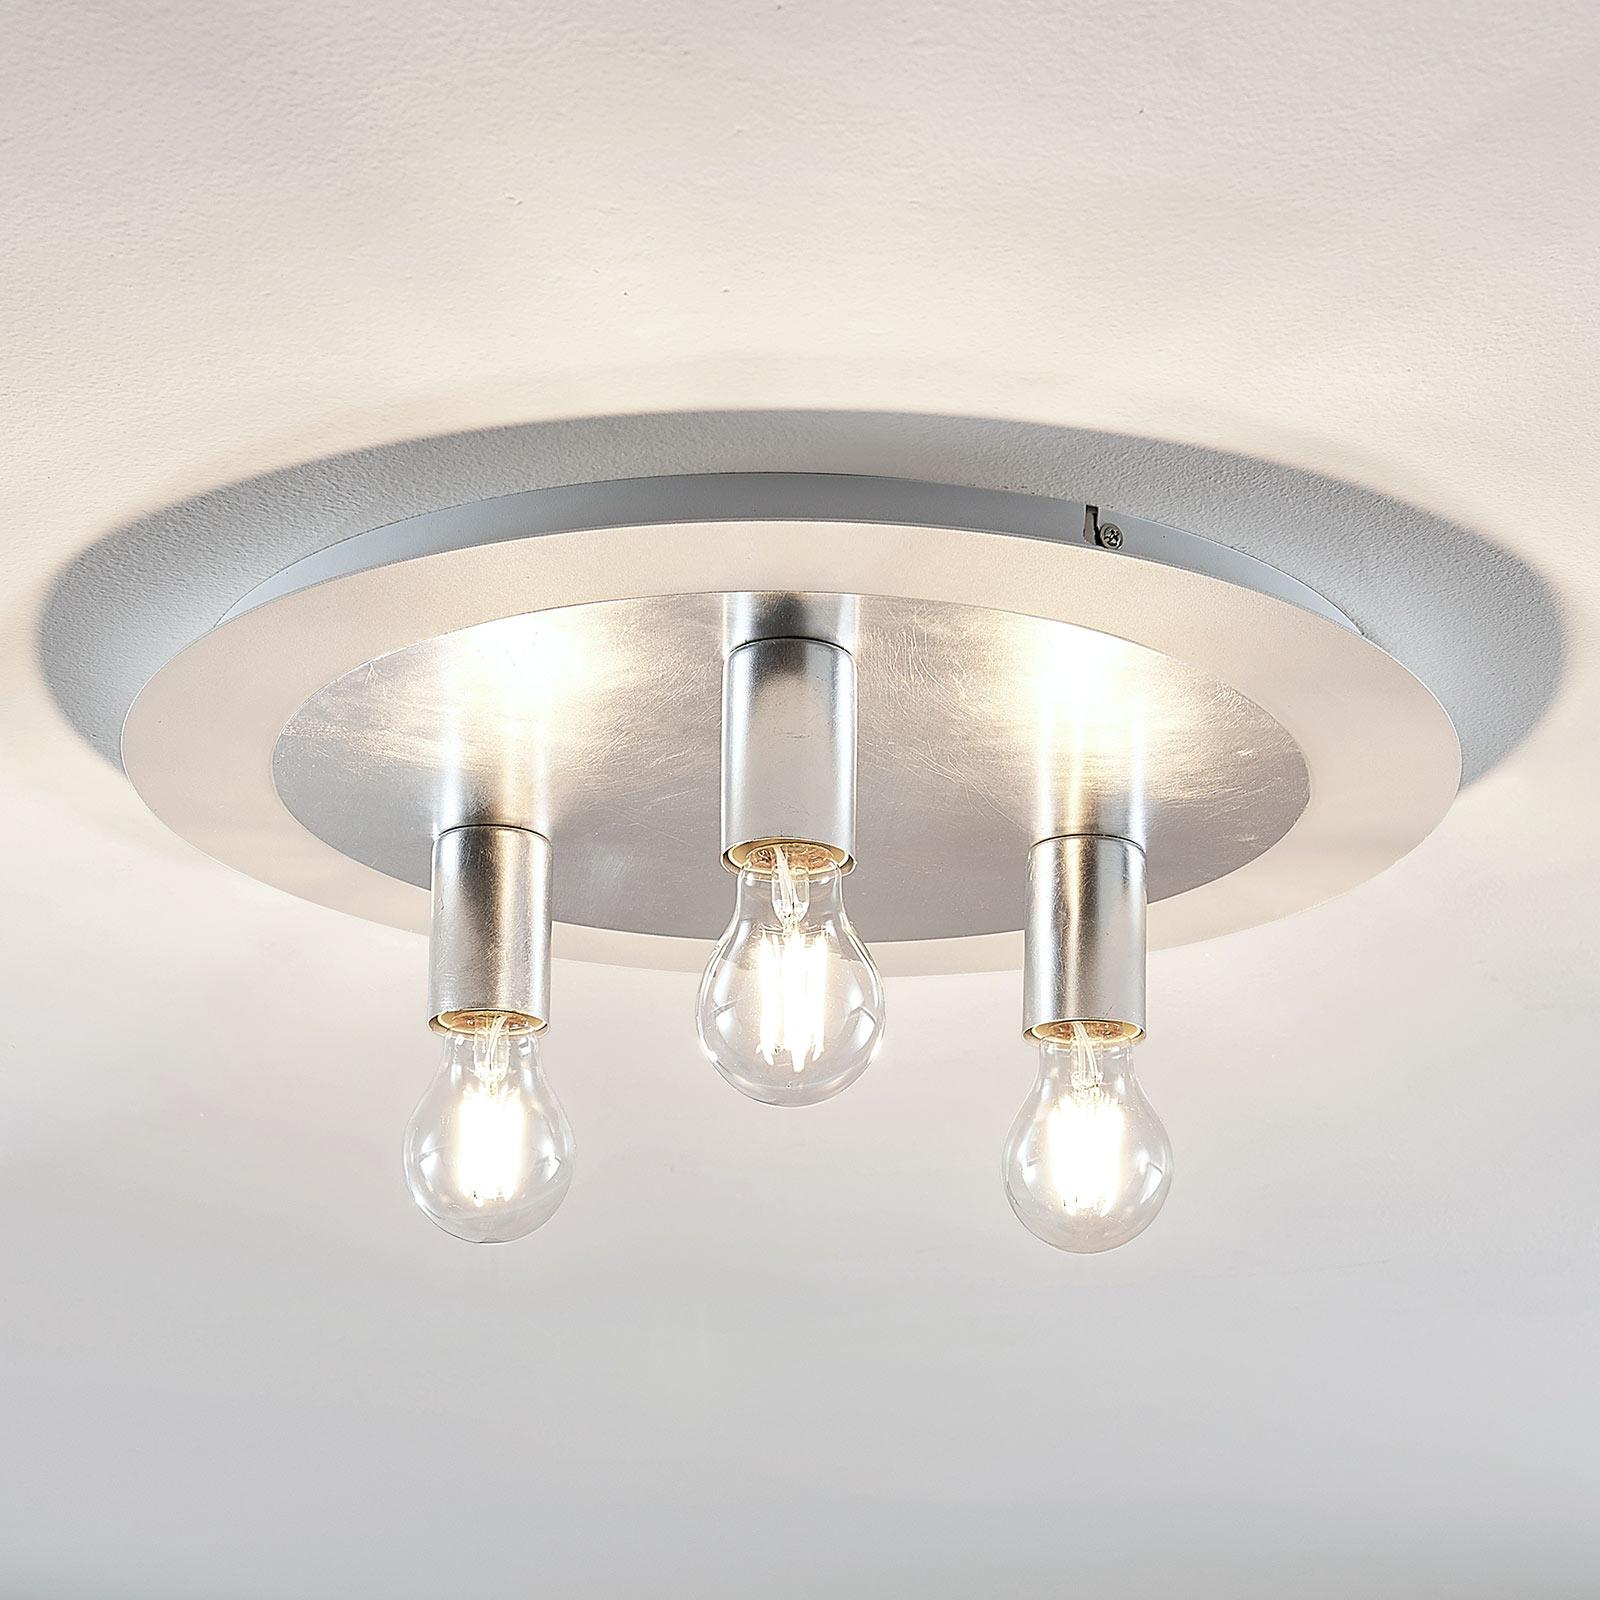 Metalowa lampa sufitowa Justik, 3-punktowa, biała